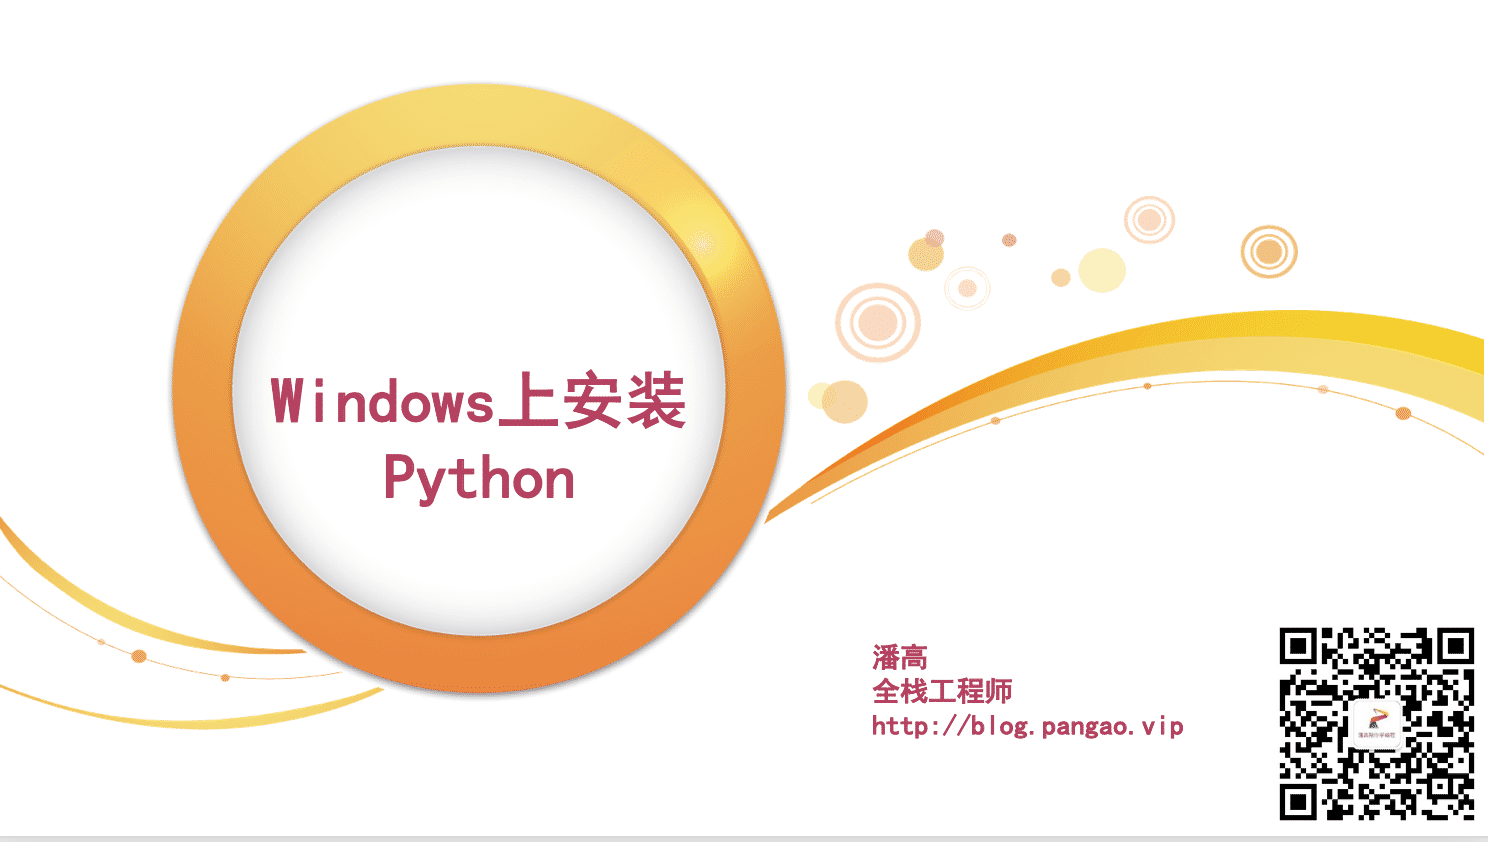 Windows上安装Python-Python入门到精通